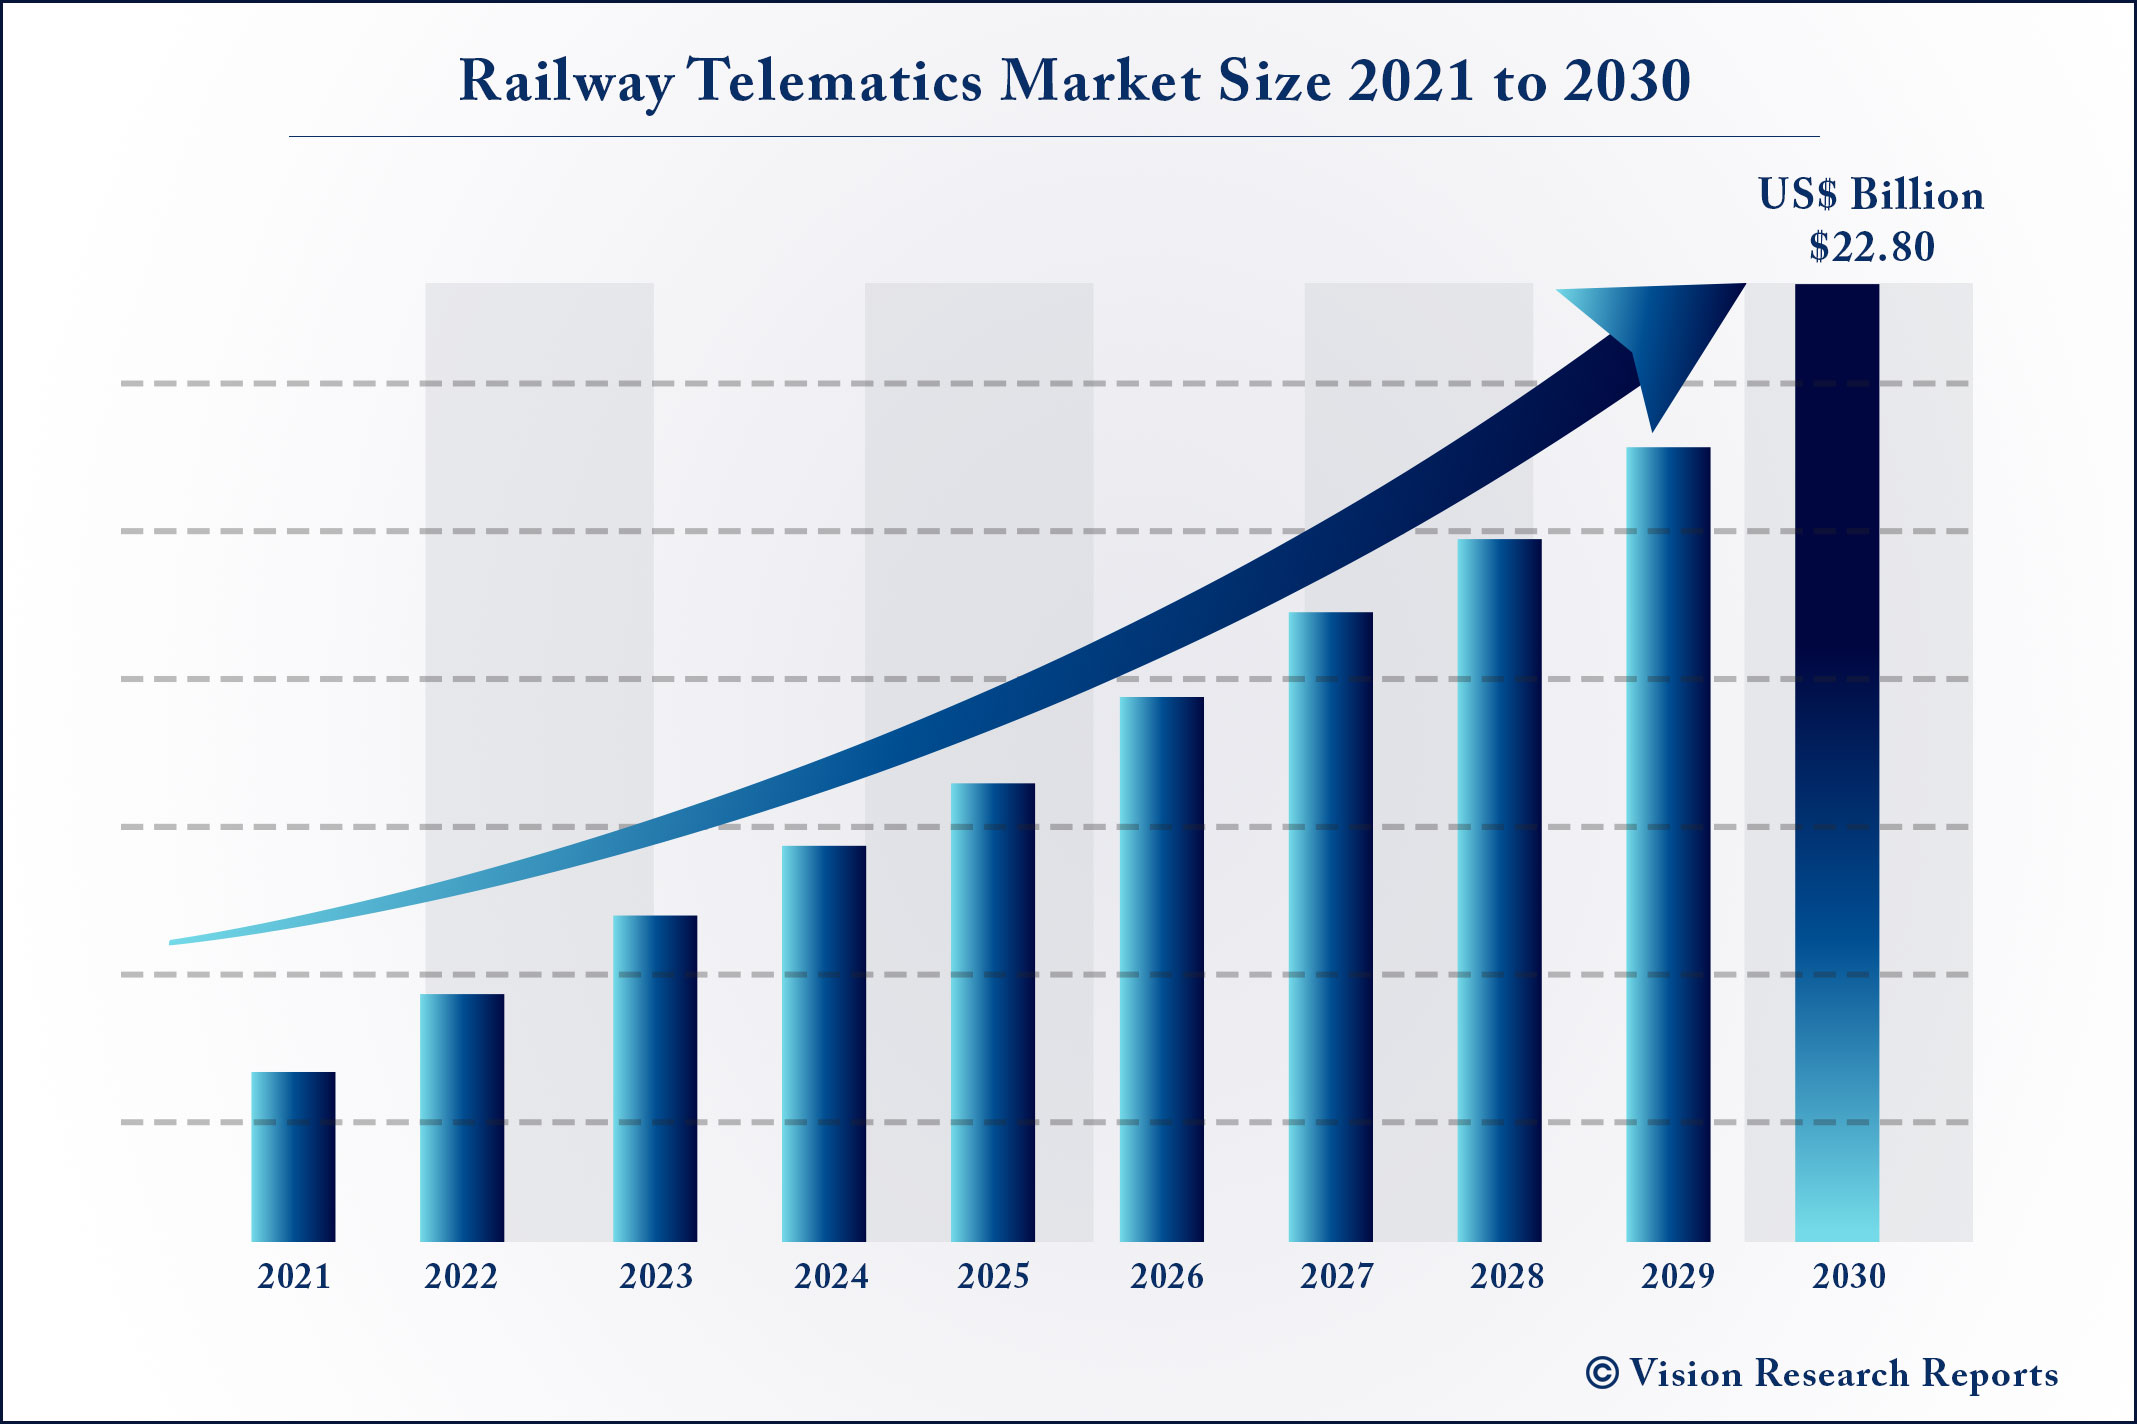 Railway Telematics Market Size 2021 to 2030